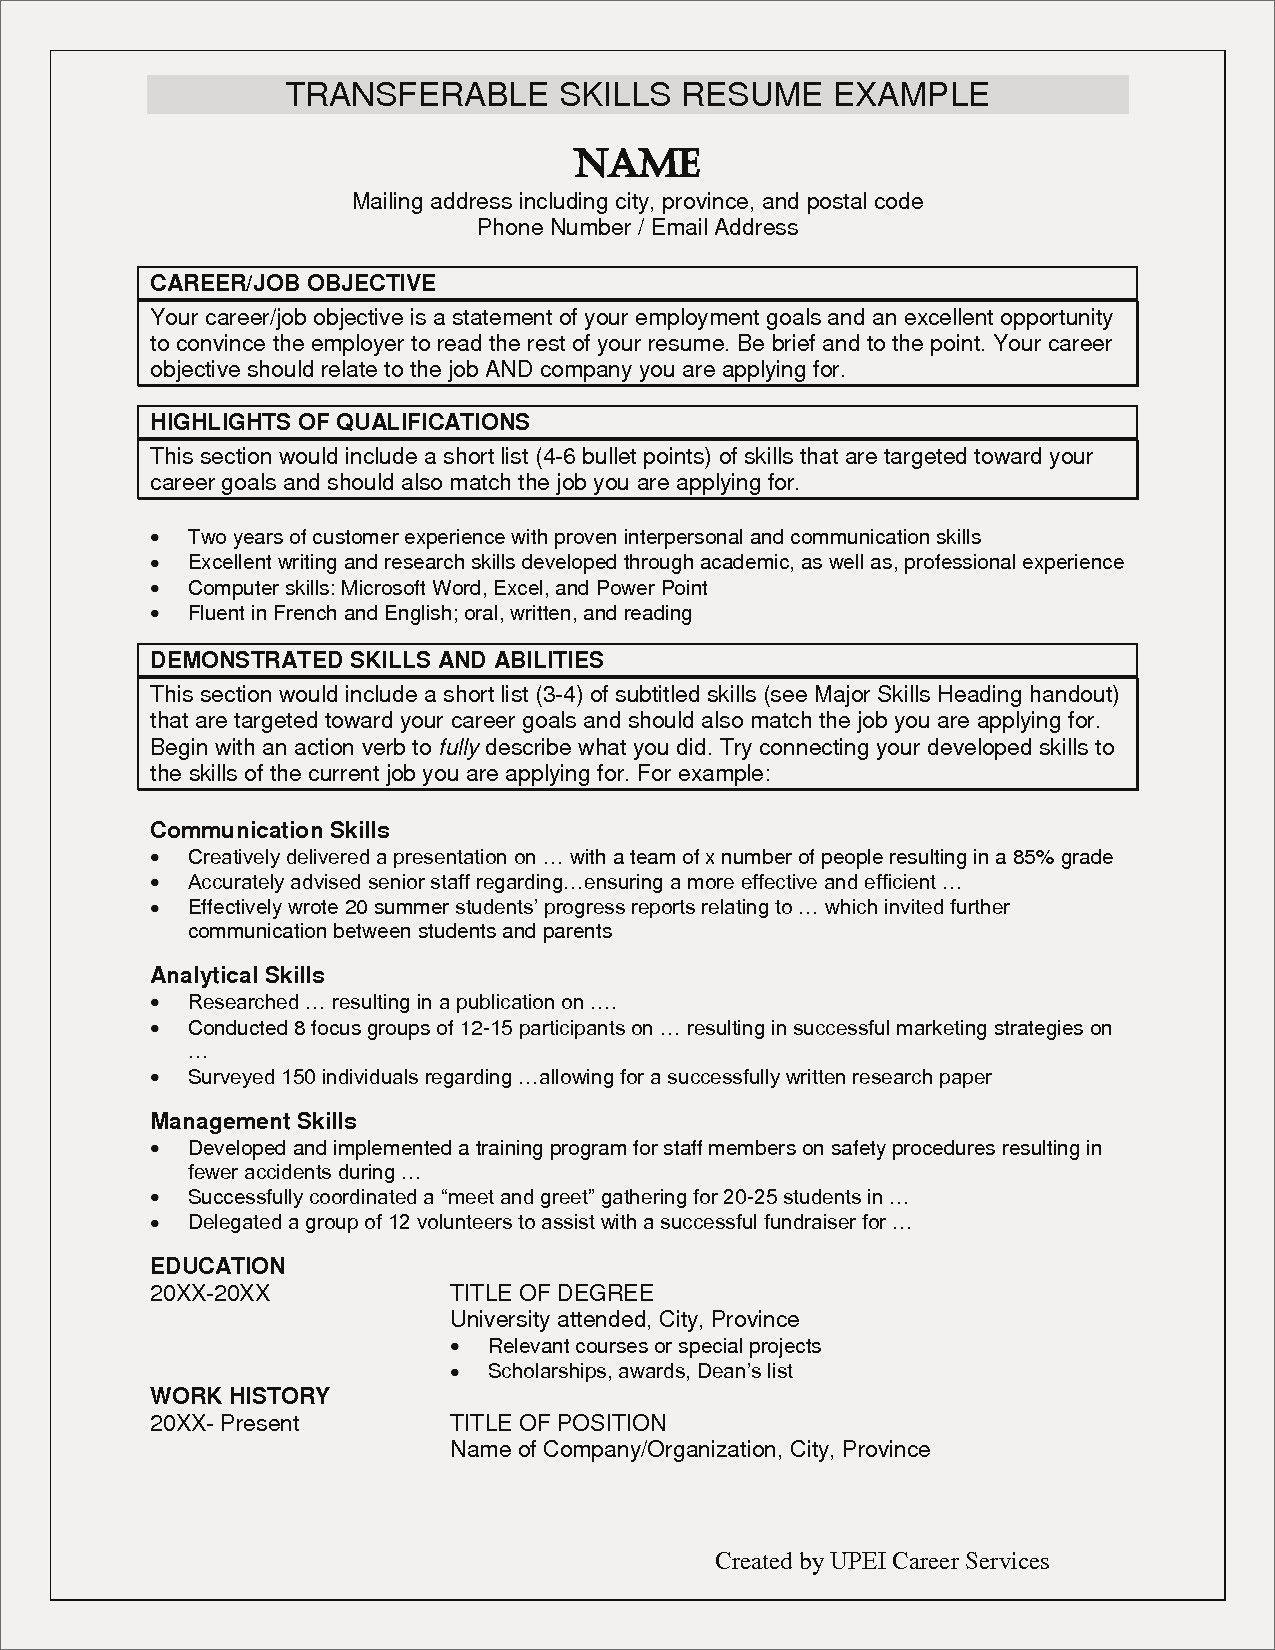 Resume Statement Examples Resume skills, Resume skills